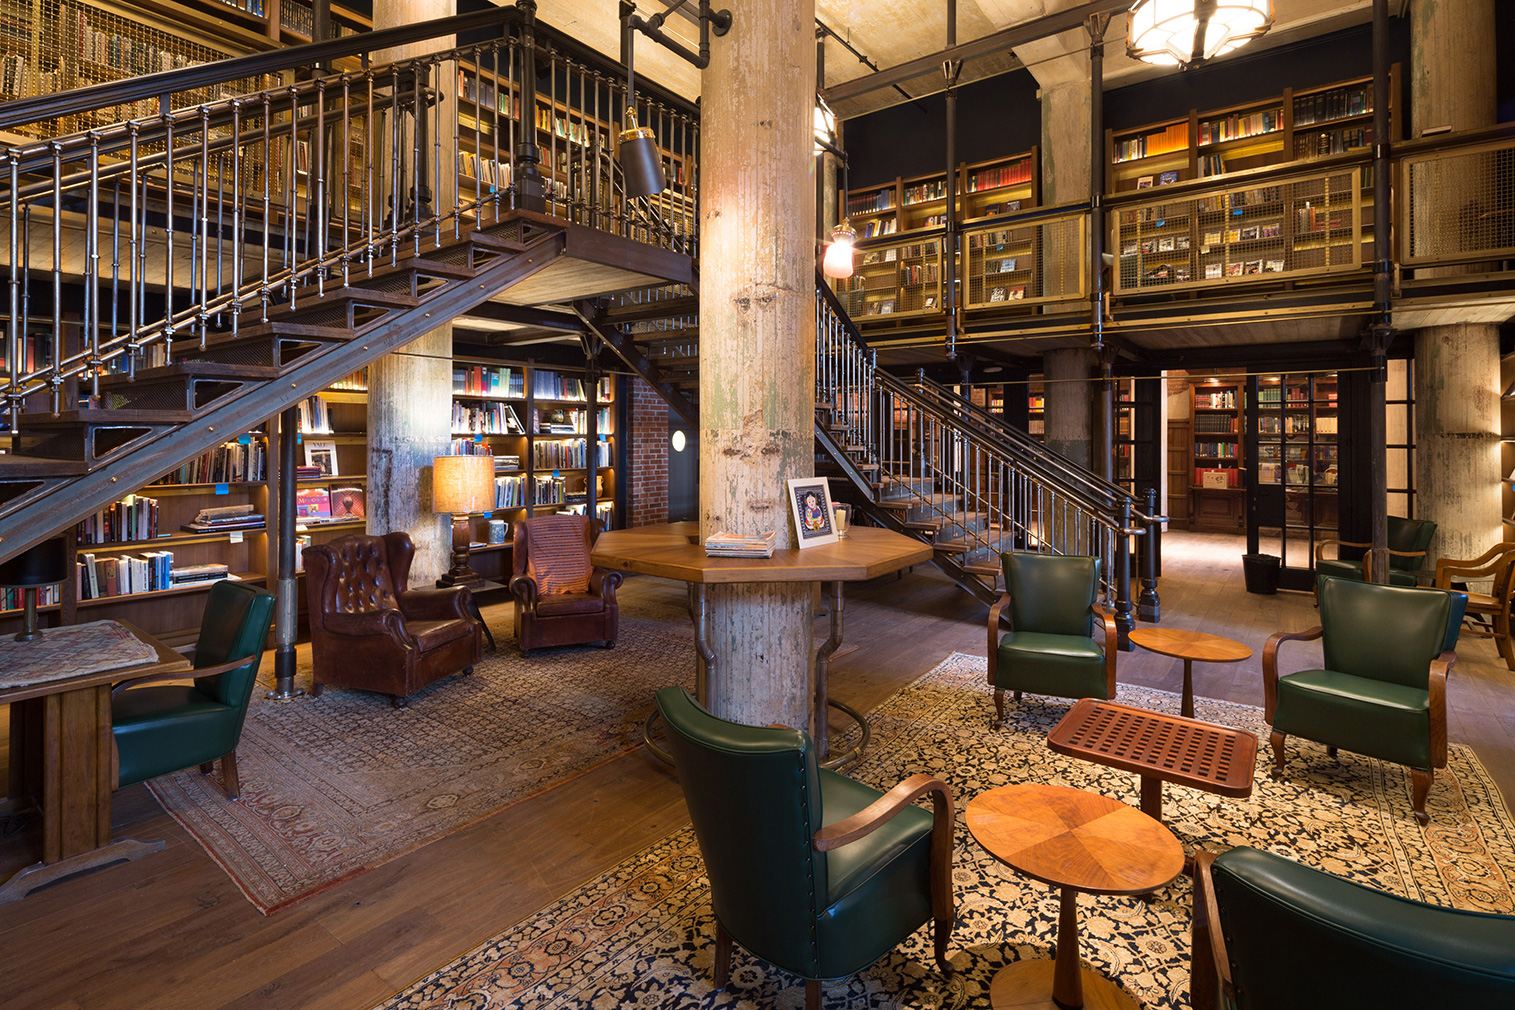 4-Hotel-Emma-Cred-Scott-Martin1.jpg